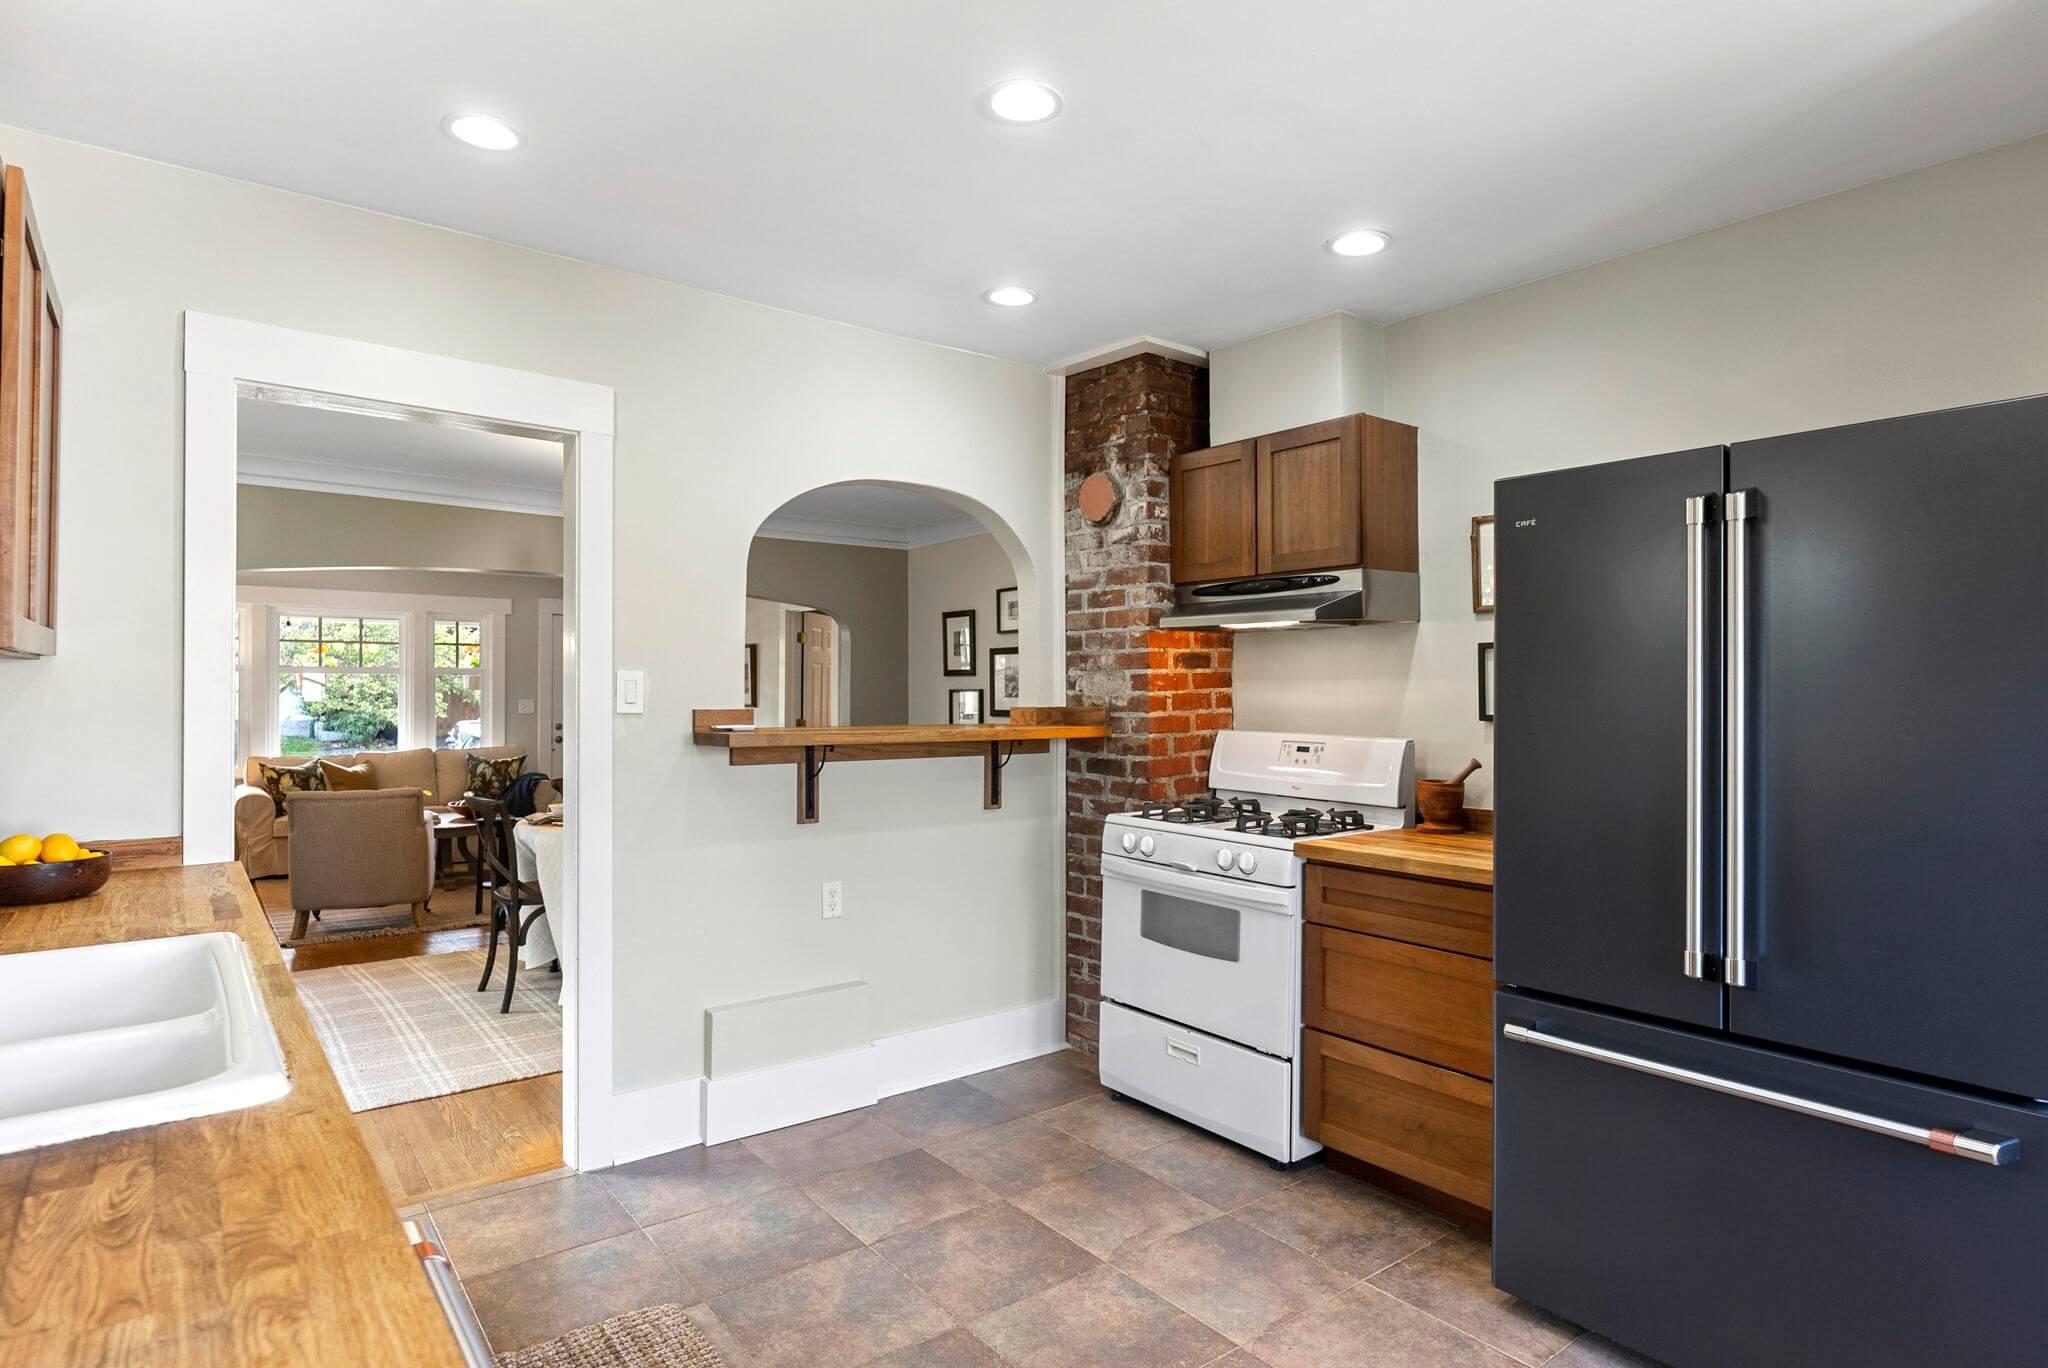 Newer GE Cafe black stainless refrigerator